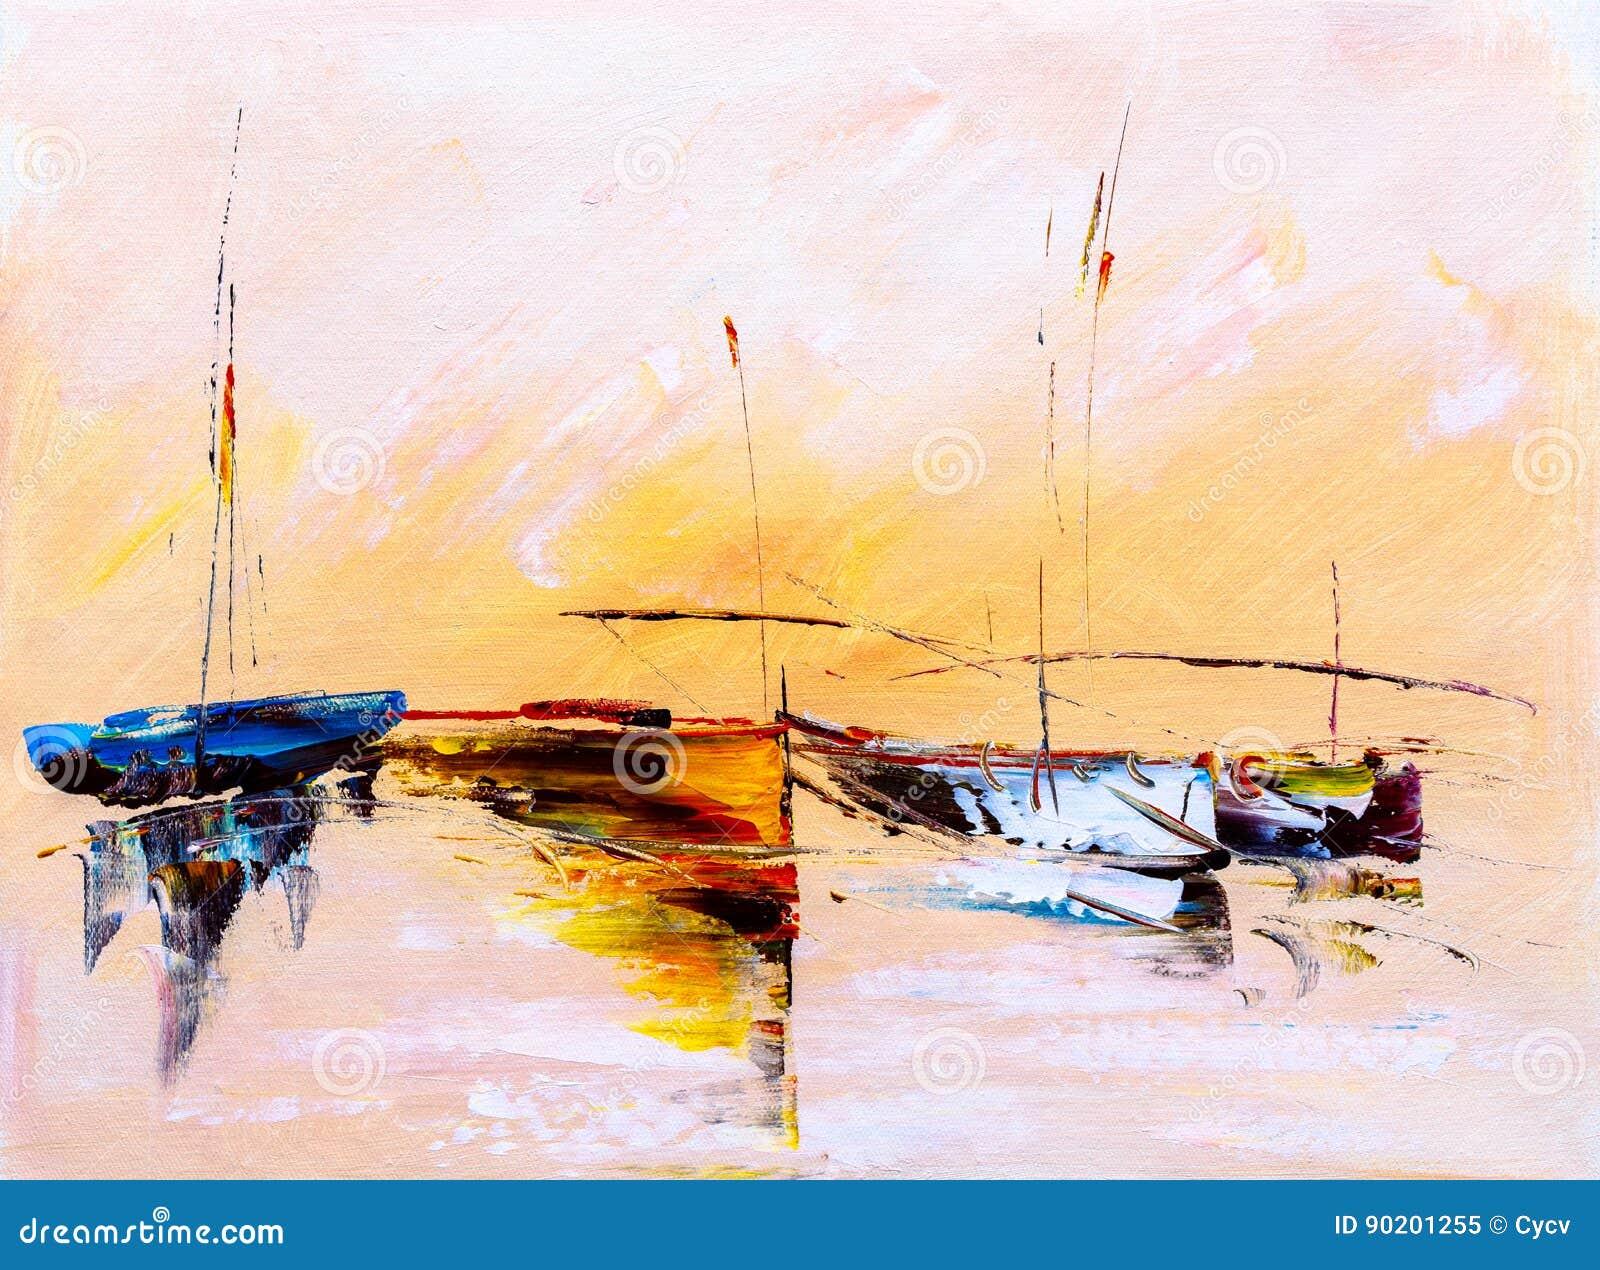 Obraz Olejny - łódź